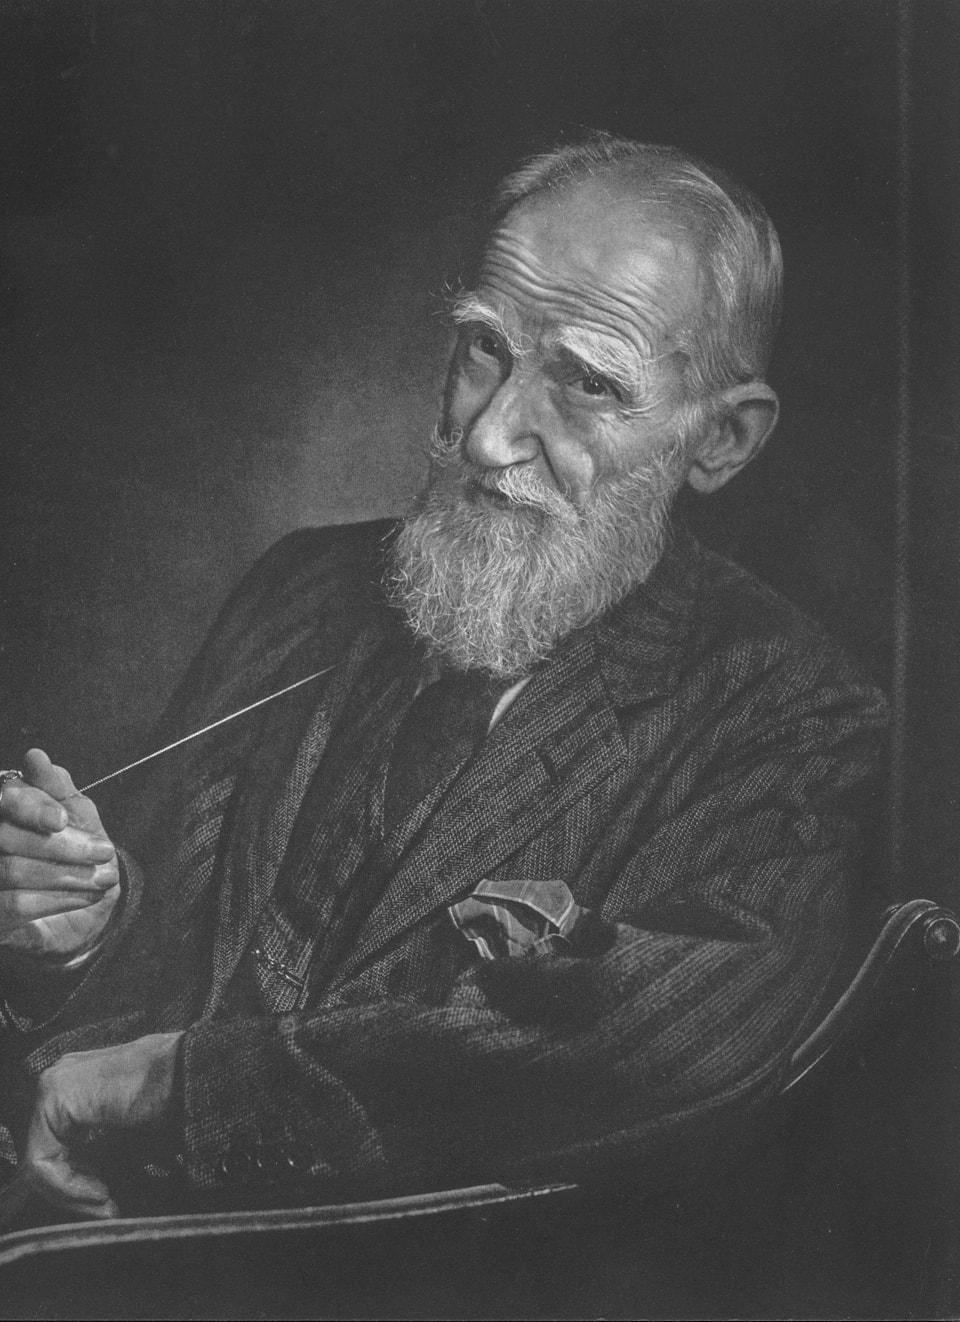 George Bernard Shaw by Yousuf Karsh, 1943